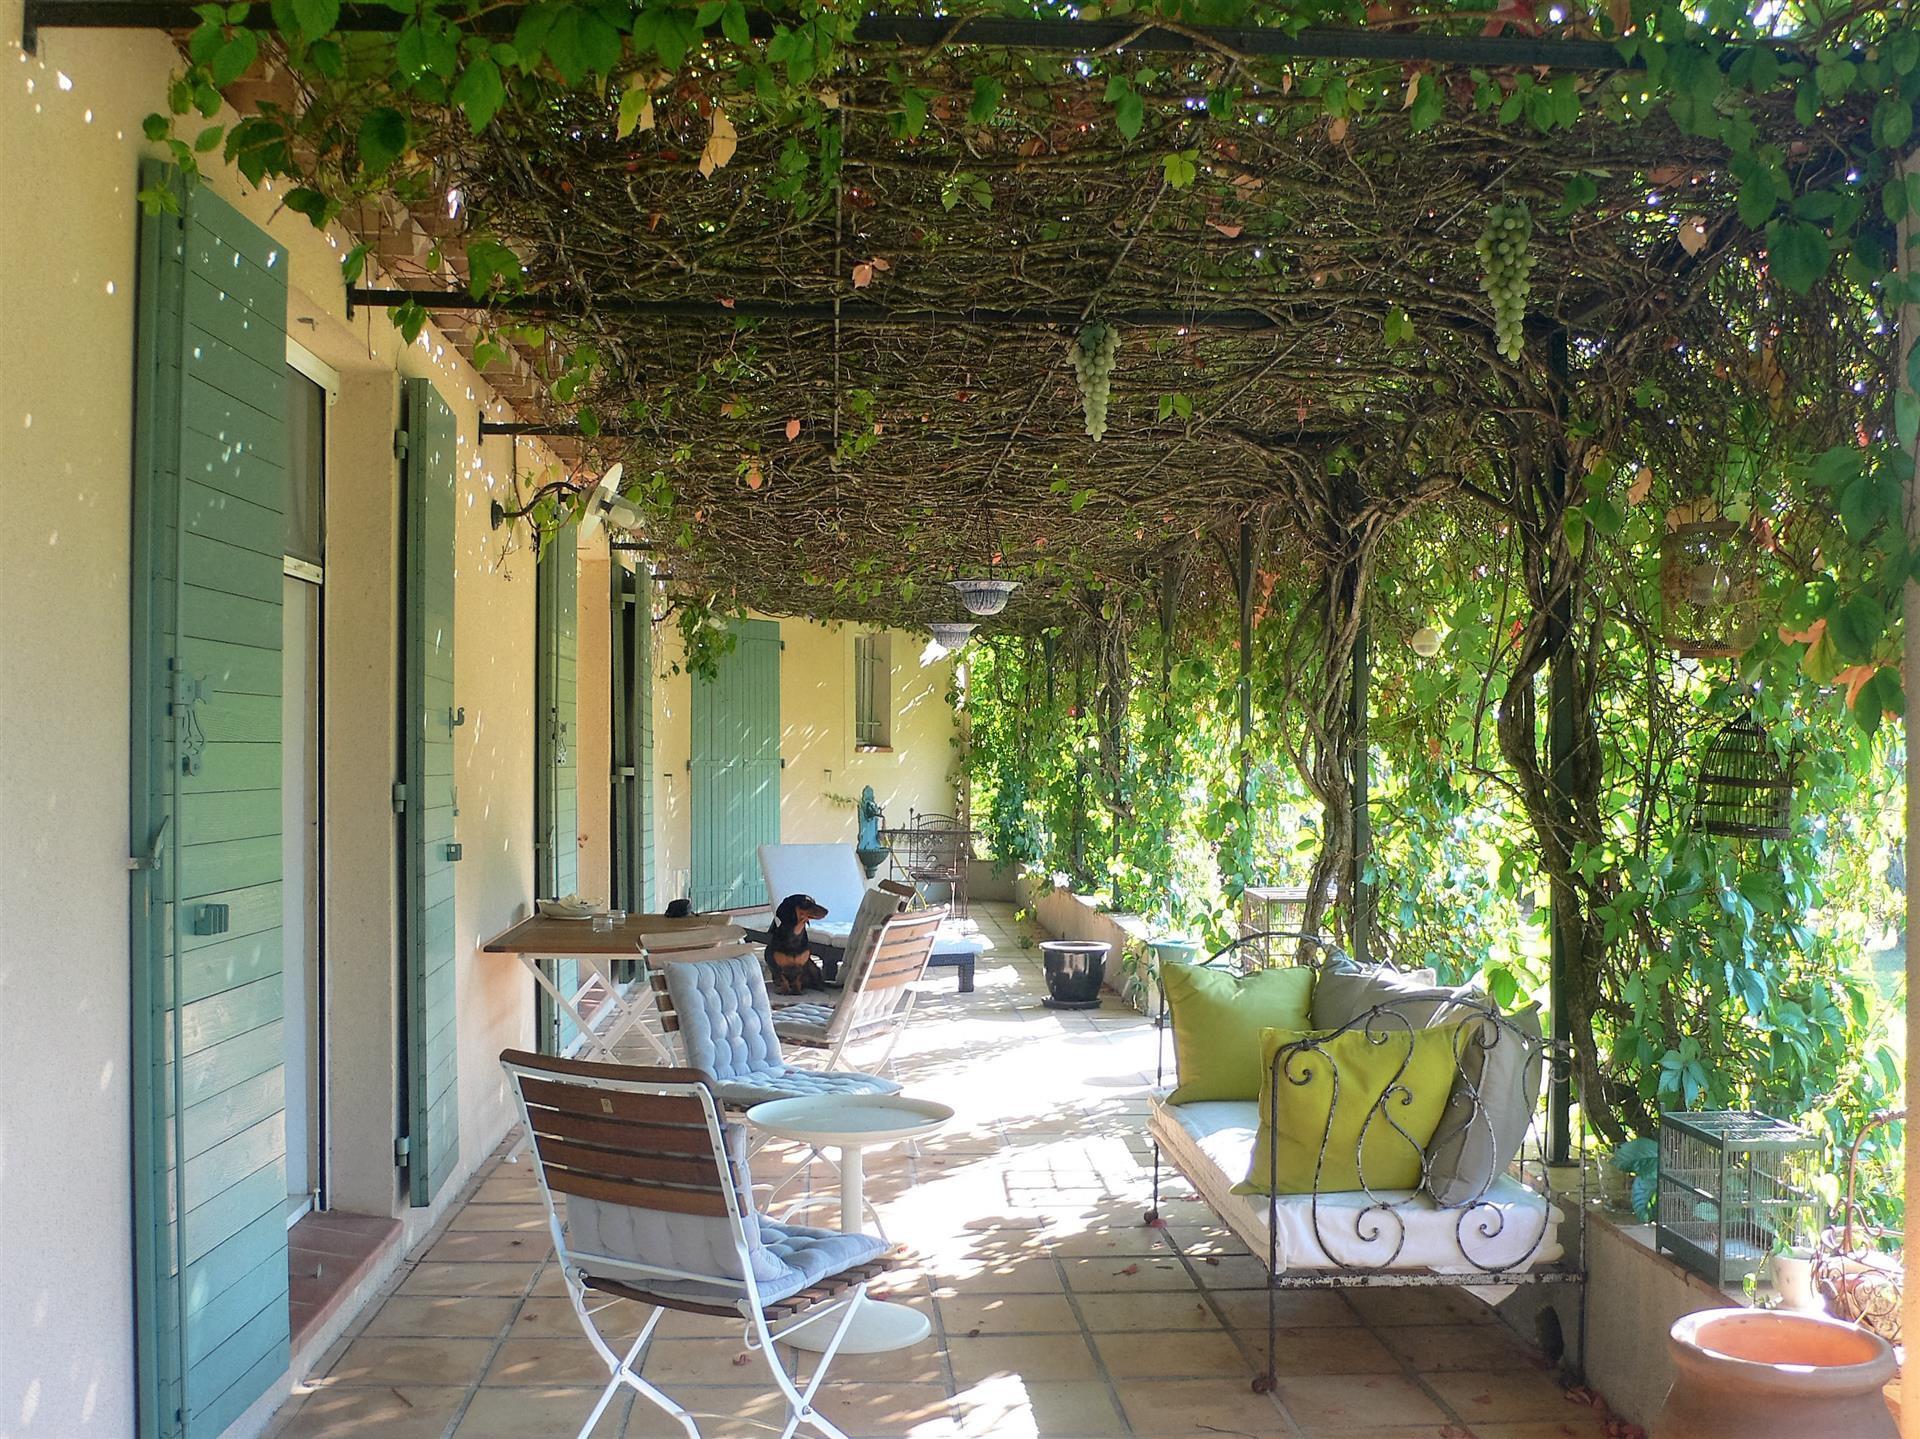 COTIGNAC belle villa de plain pied avec piscine et studio independant